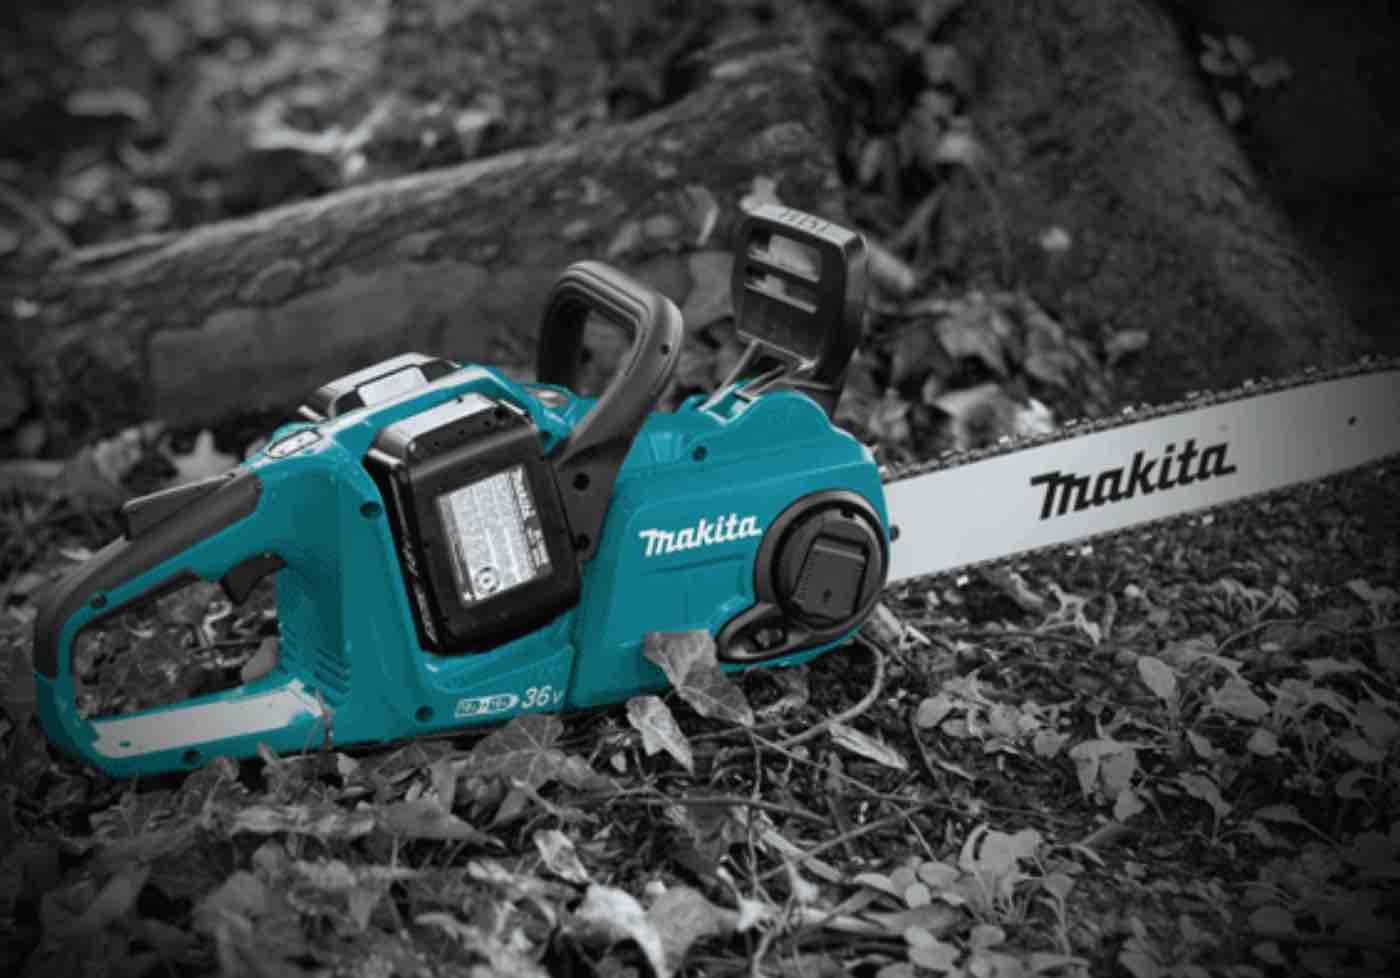 makita-outdoors.jpg